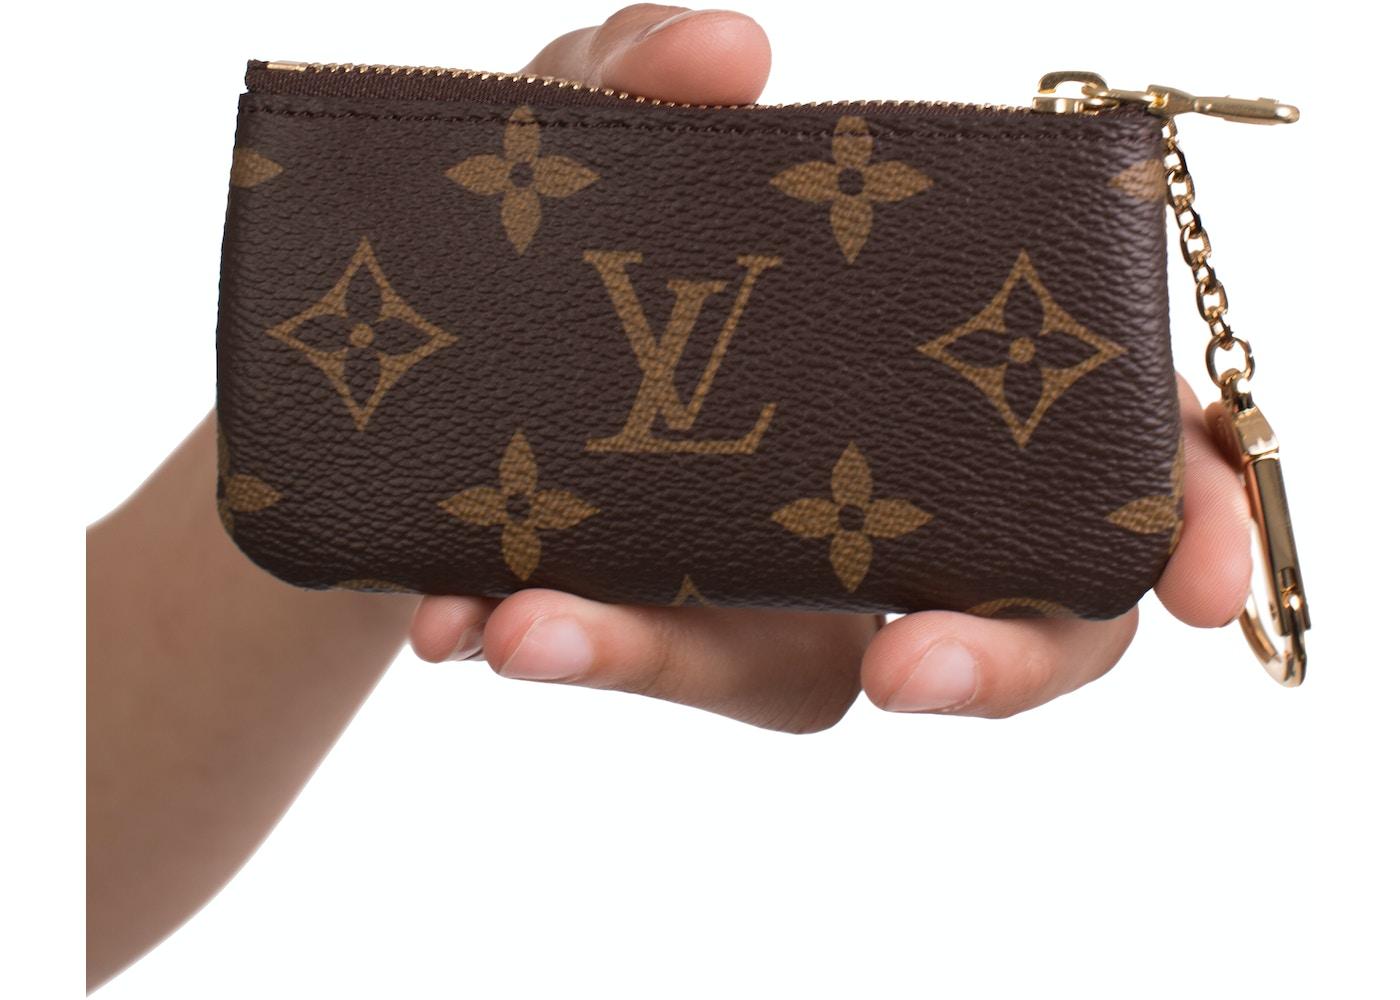 5860ef18dbcf Buy   Sell Louis Vuitton Luxury Handbags